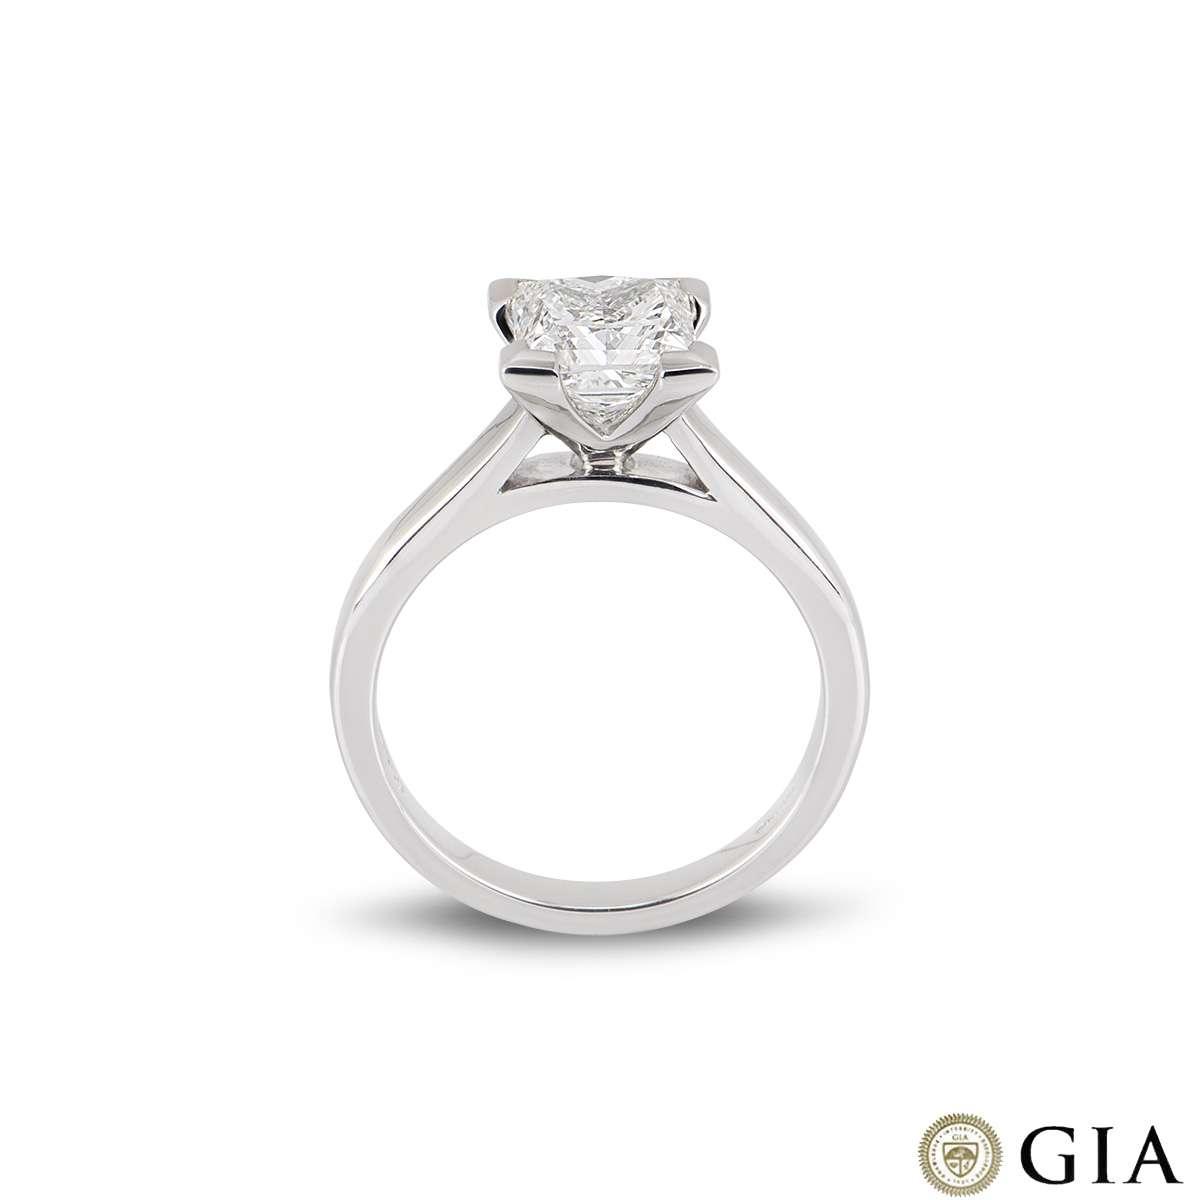 White Gold Diamond Princess Cut Diamond Ring 2.01ct G/VS1